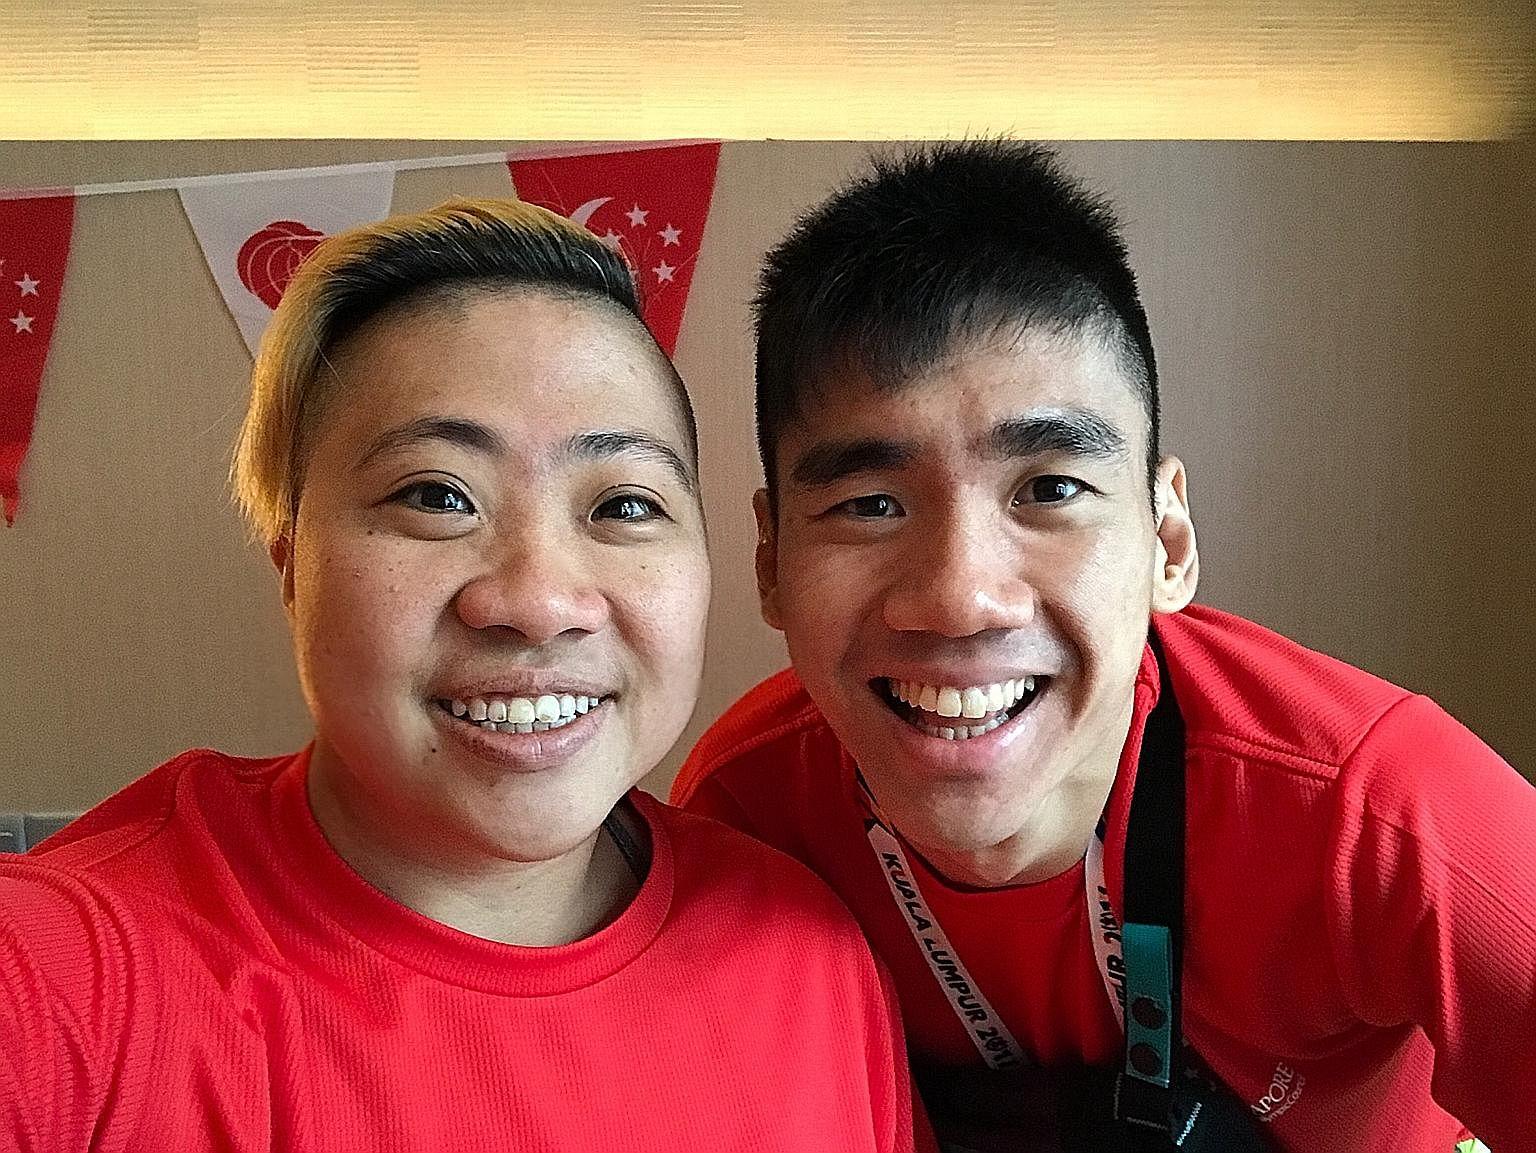 Para-swimmer Theresa Goh and para-shuttler Tay Wei Ming are hoping to strike gold at the Asean Para Games in Kuala Lumpur.